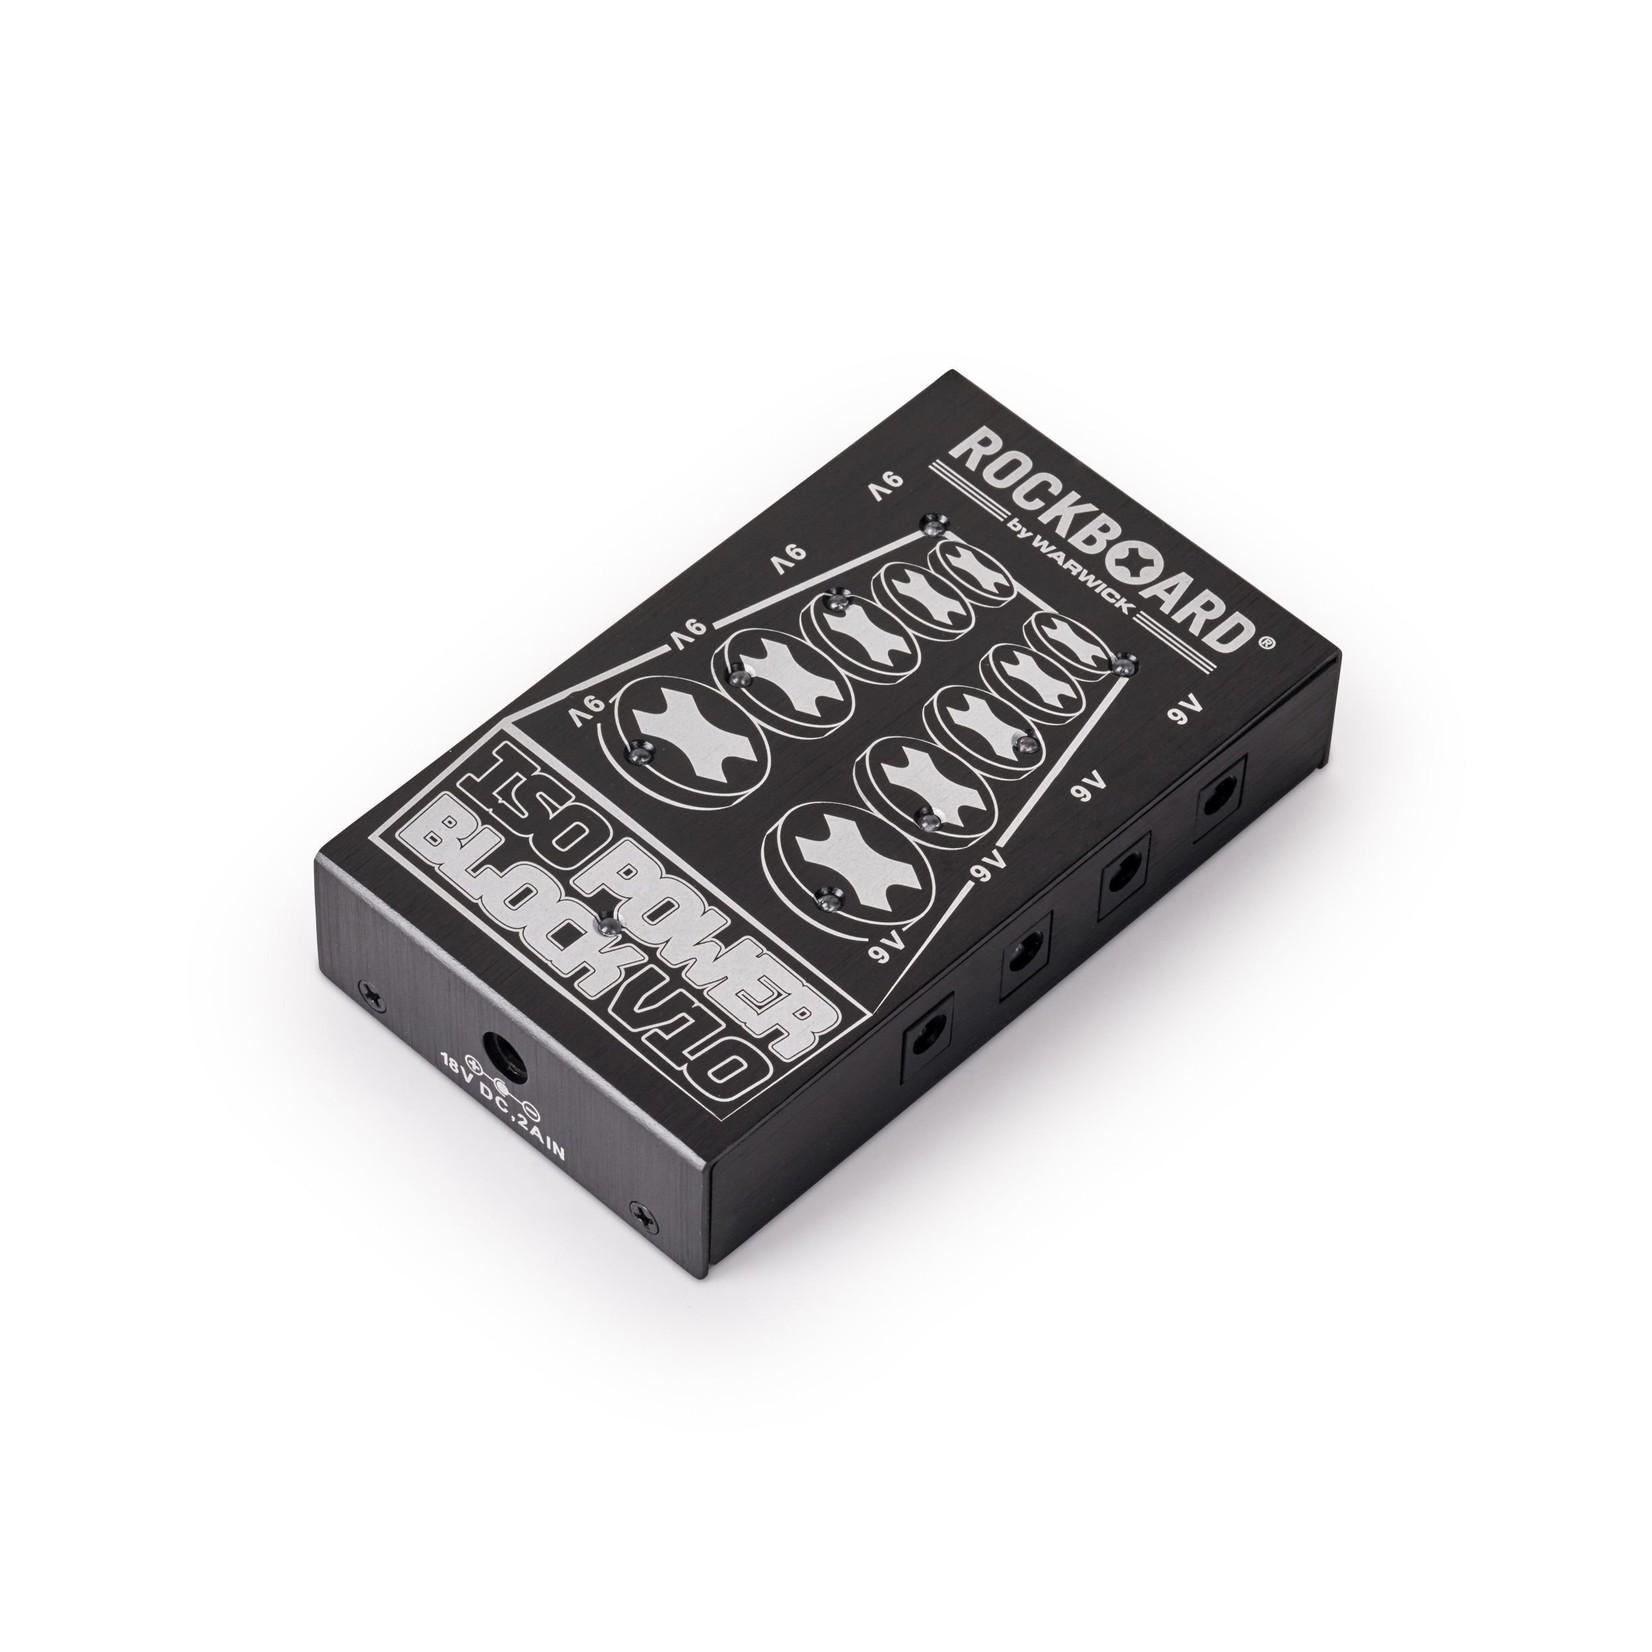 Rockboard Rockboard ISO Power Block V10 Isolated & Filtered Power Supply (8x 9v   2x 18V   cables)